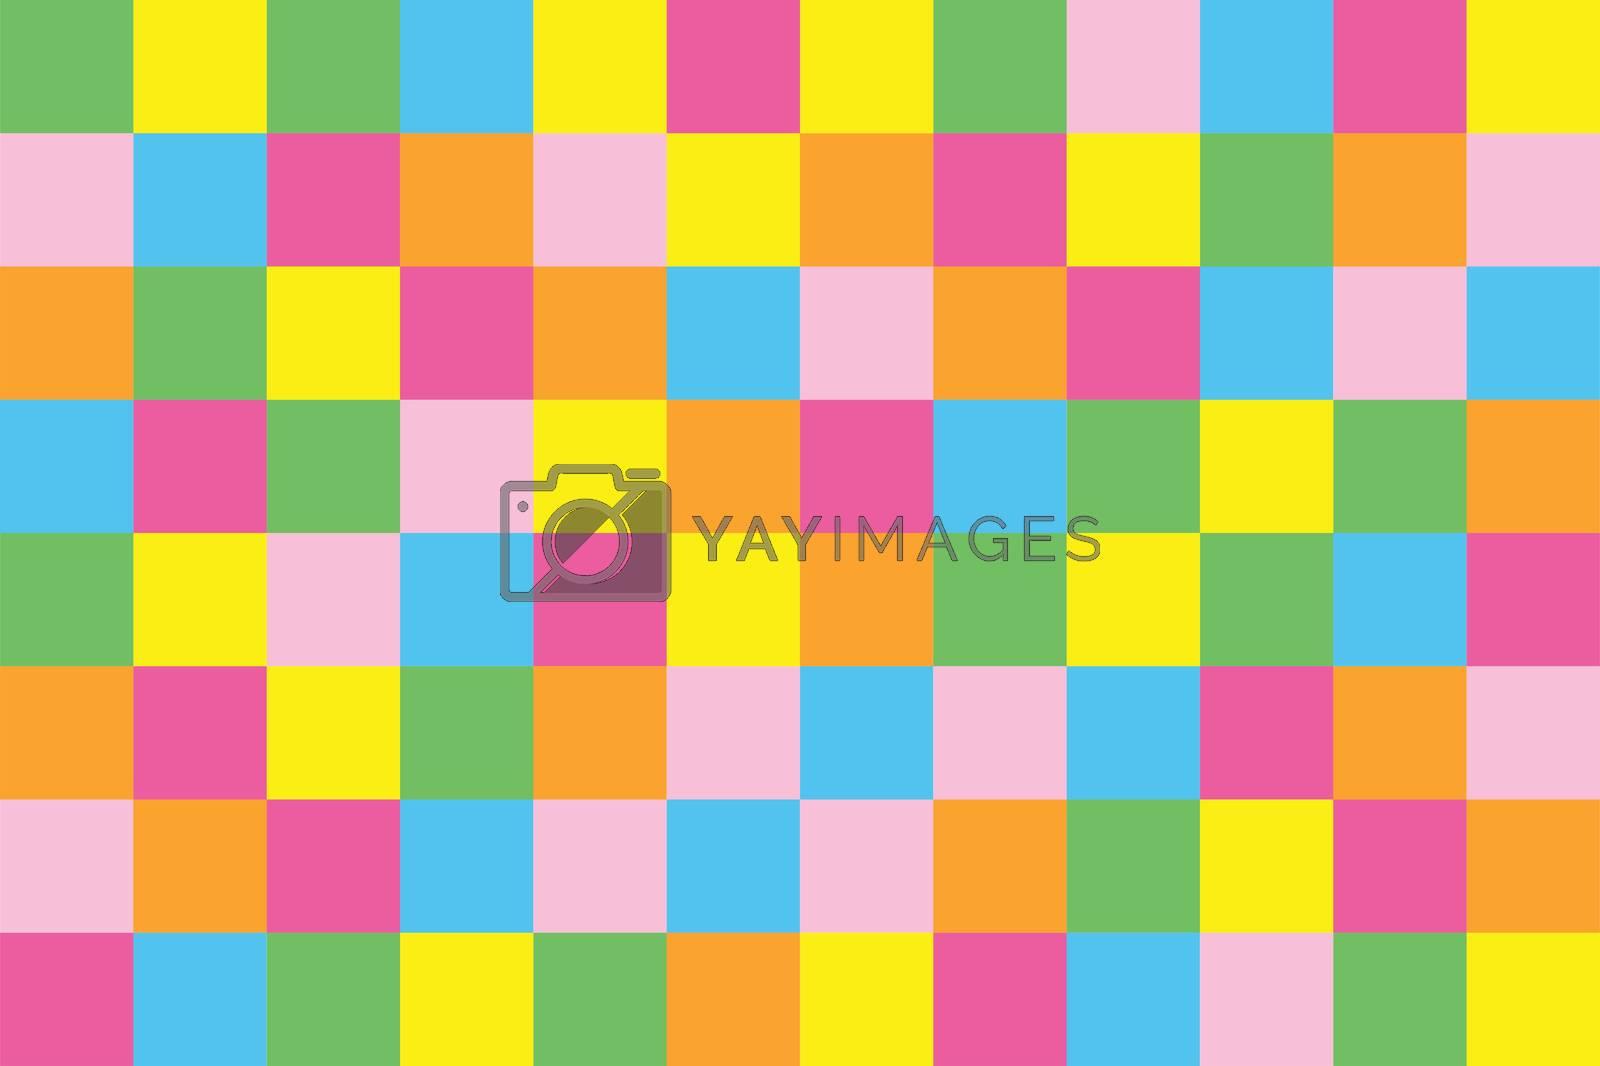 Royalty free image of Lennon Wall Flag by tony4urban